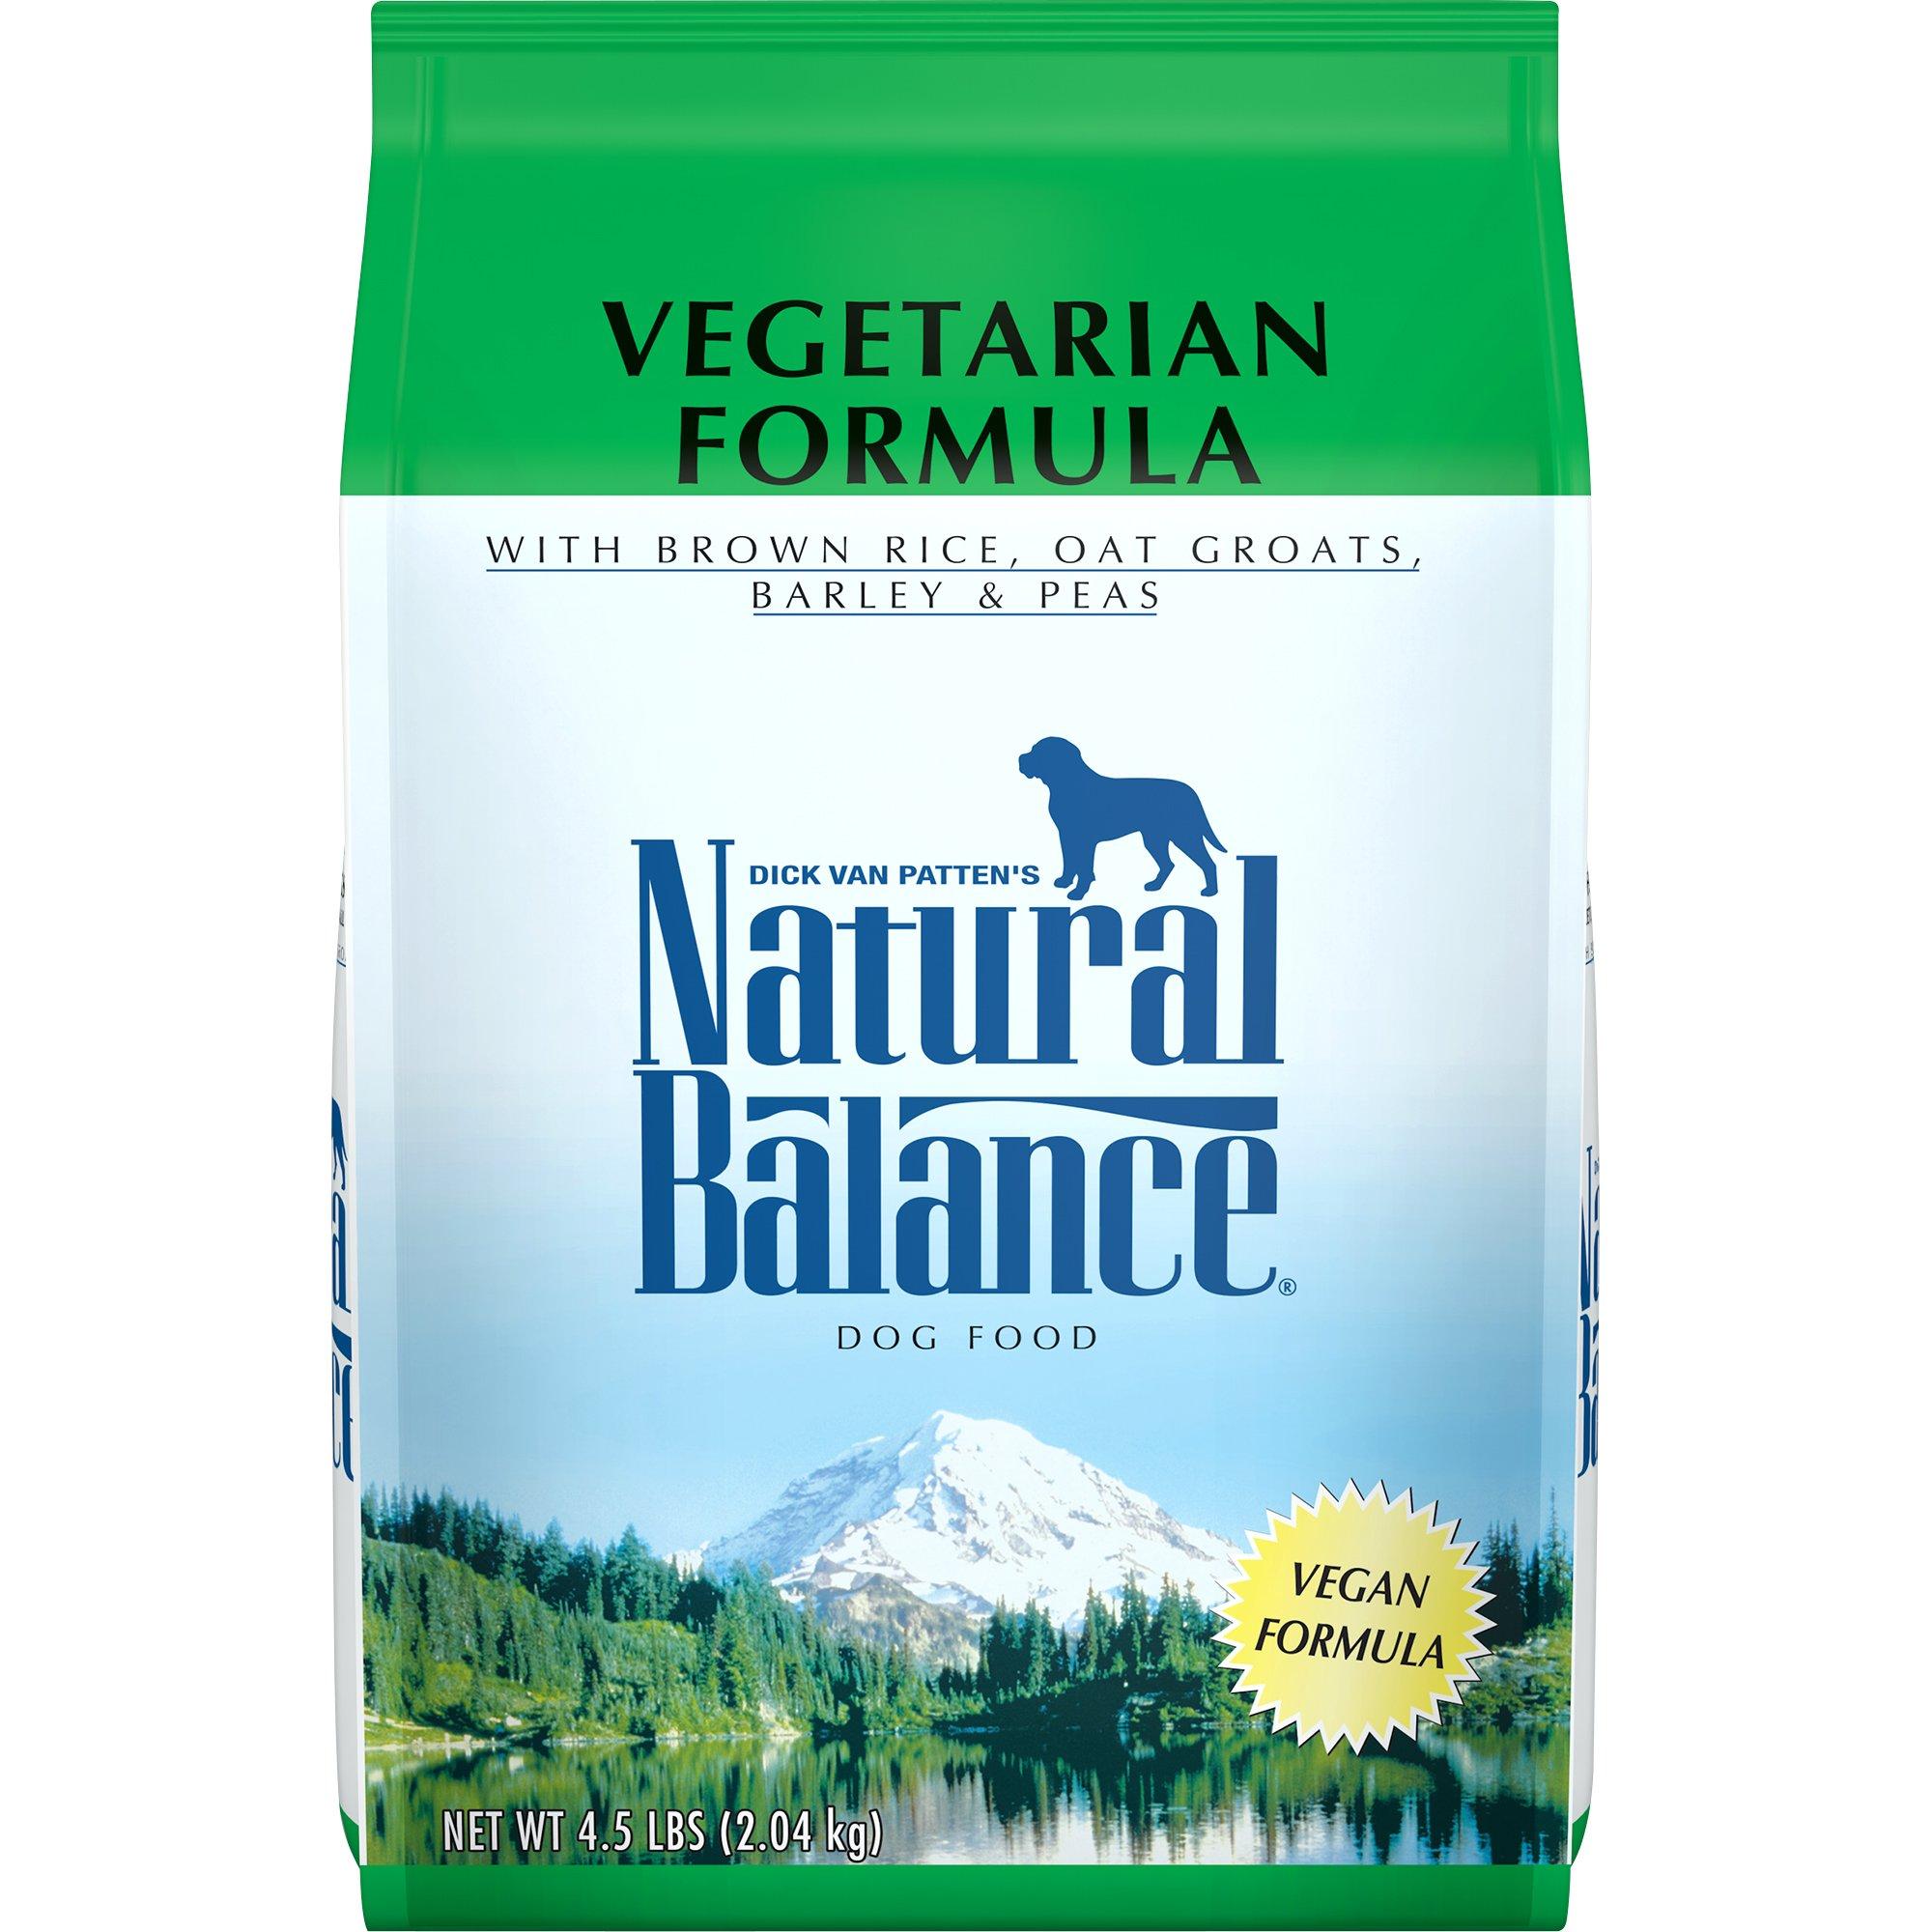 Natural Balance Vegetarian Formula Dry Dog Food, 4.5-Pound by Natural Balance (Image #1)